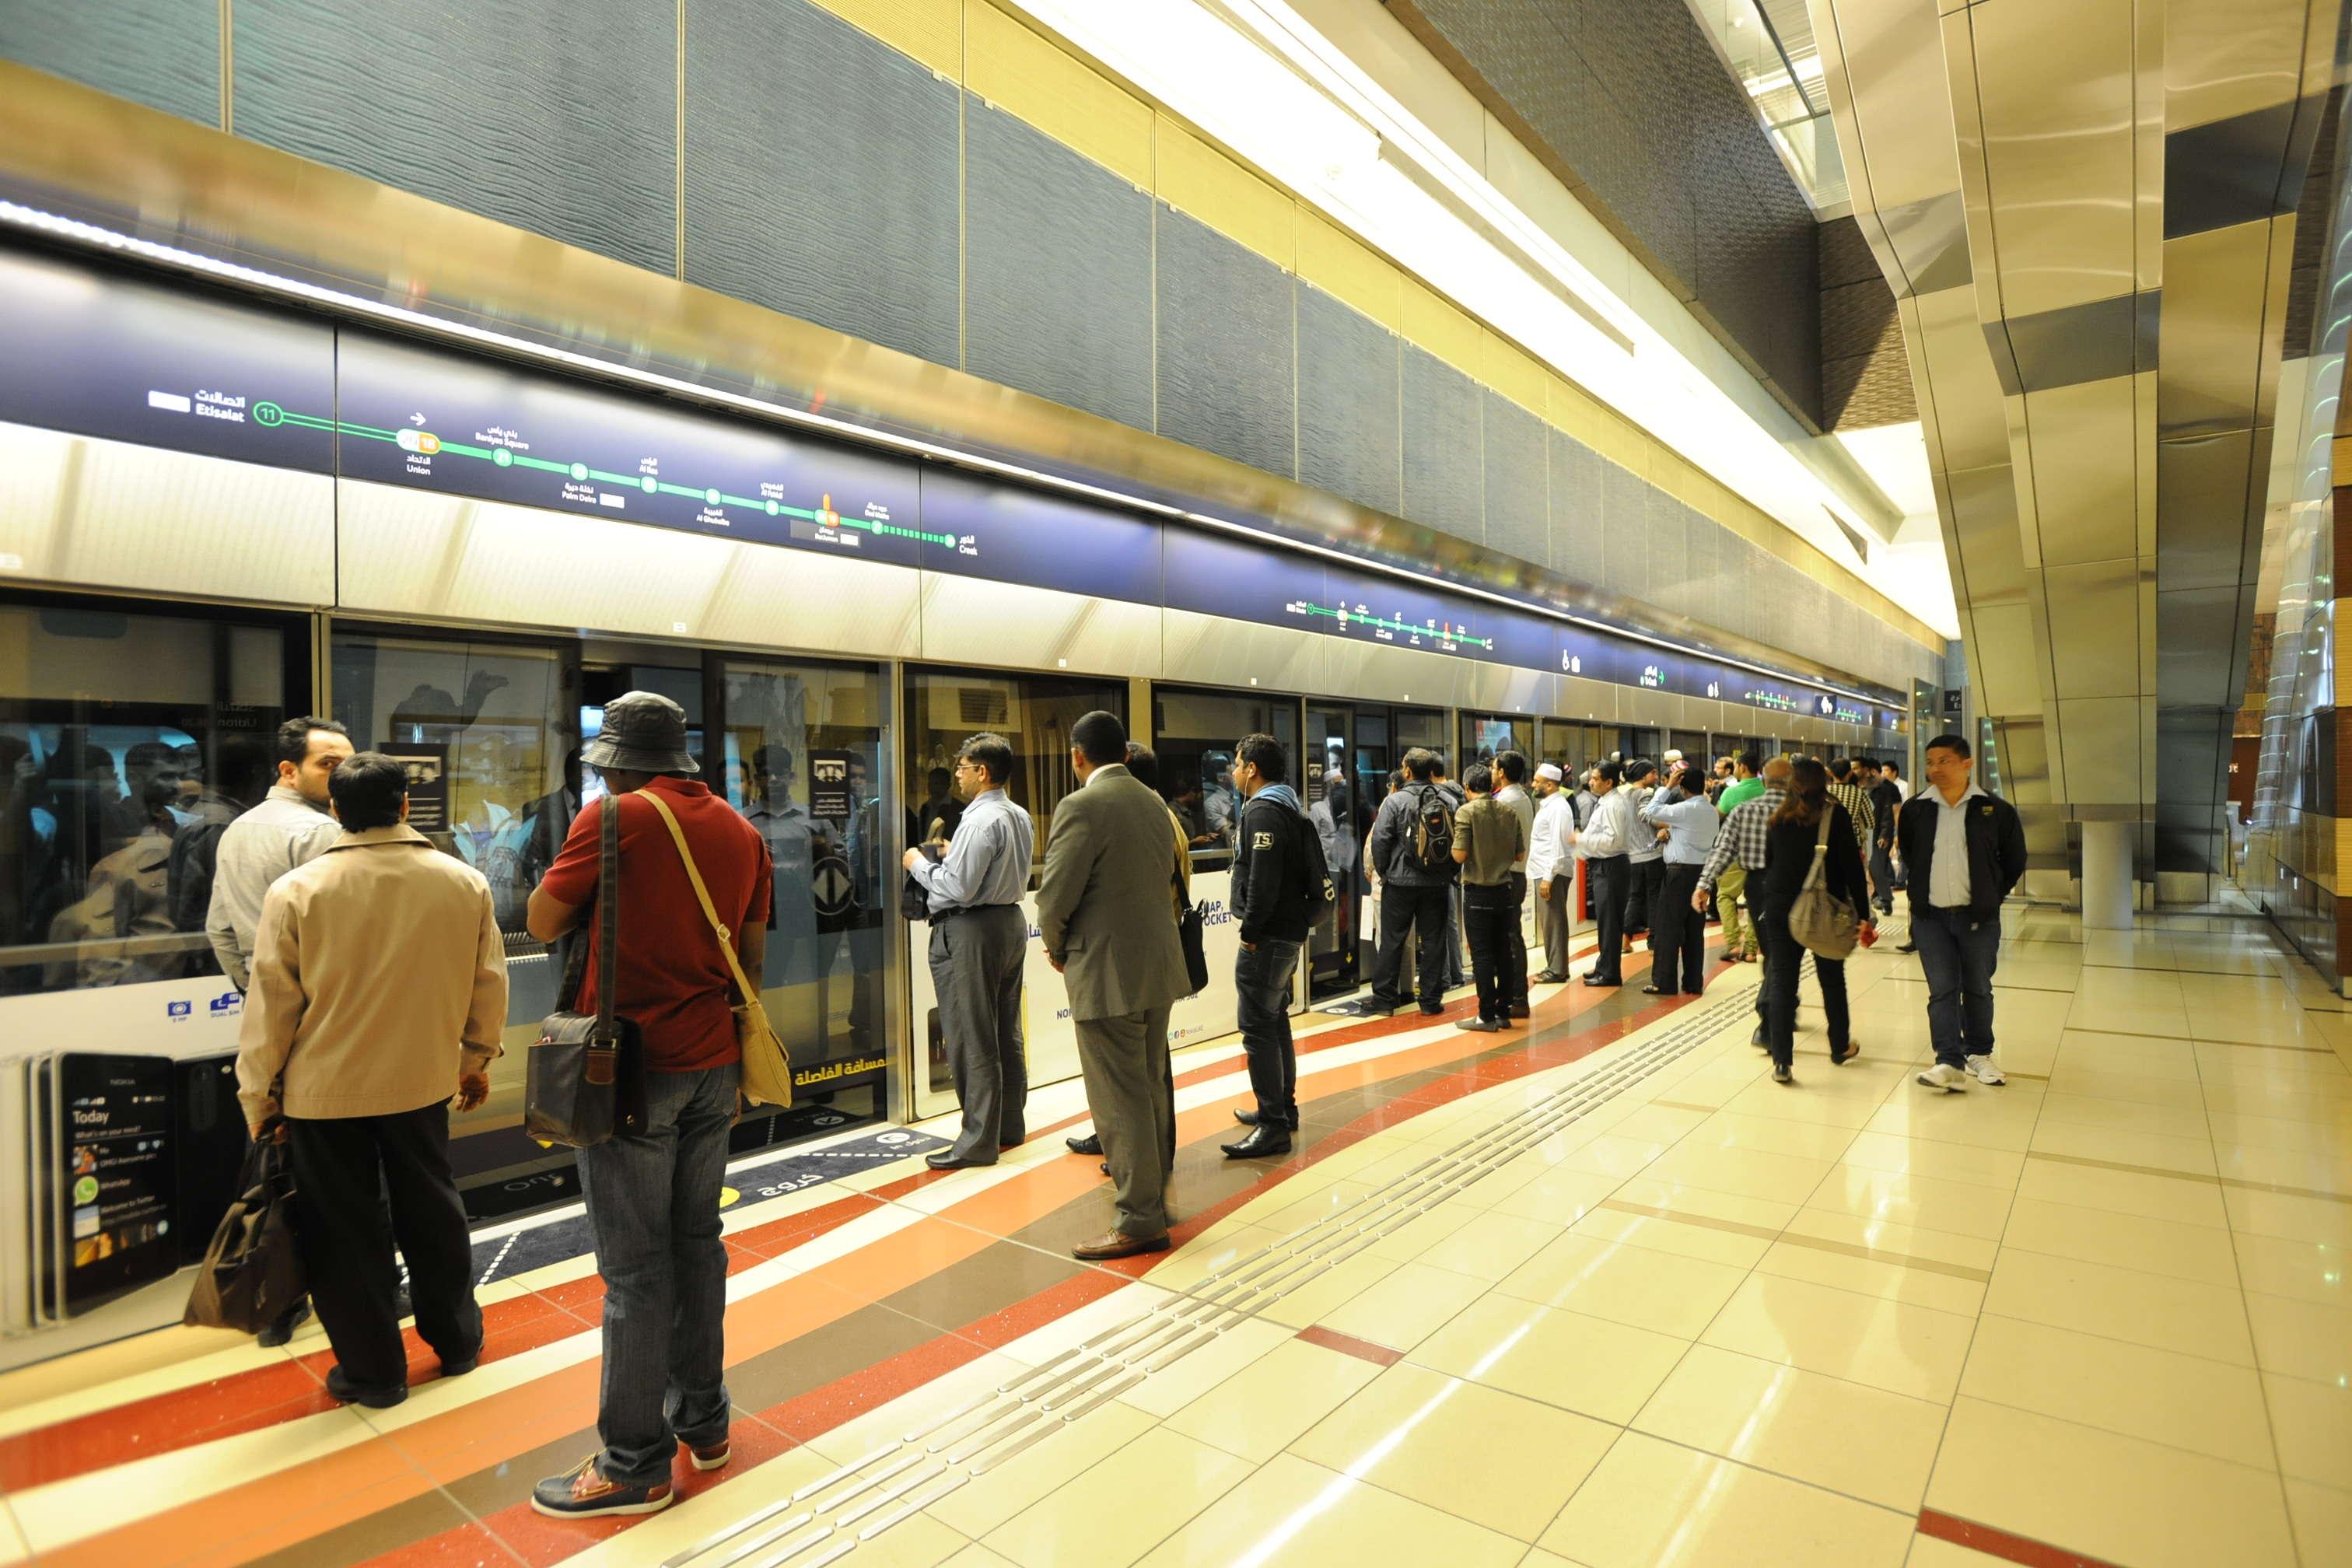 تغيير مواعيد انطلاق مترو وترام دبي